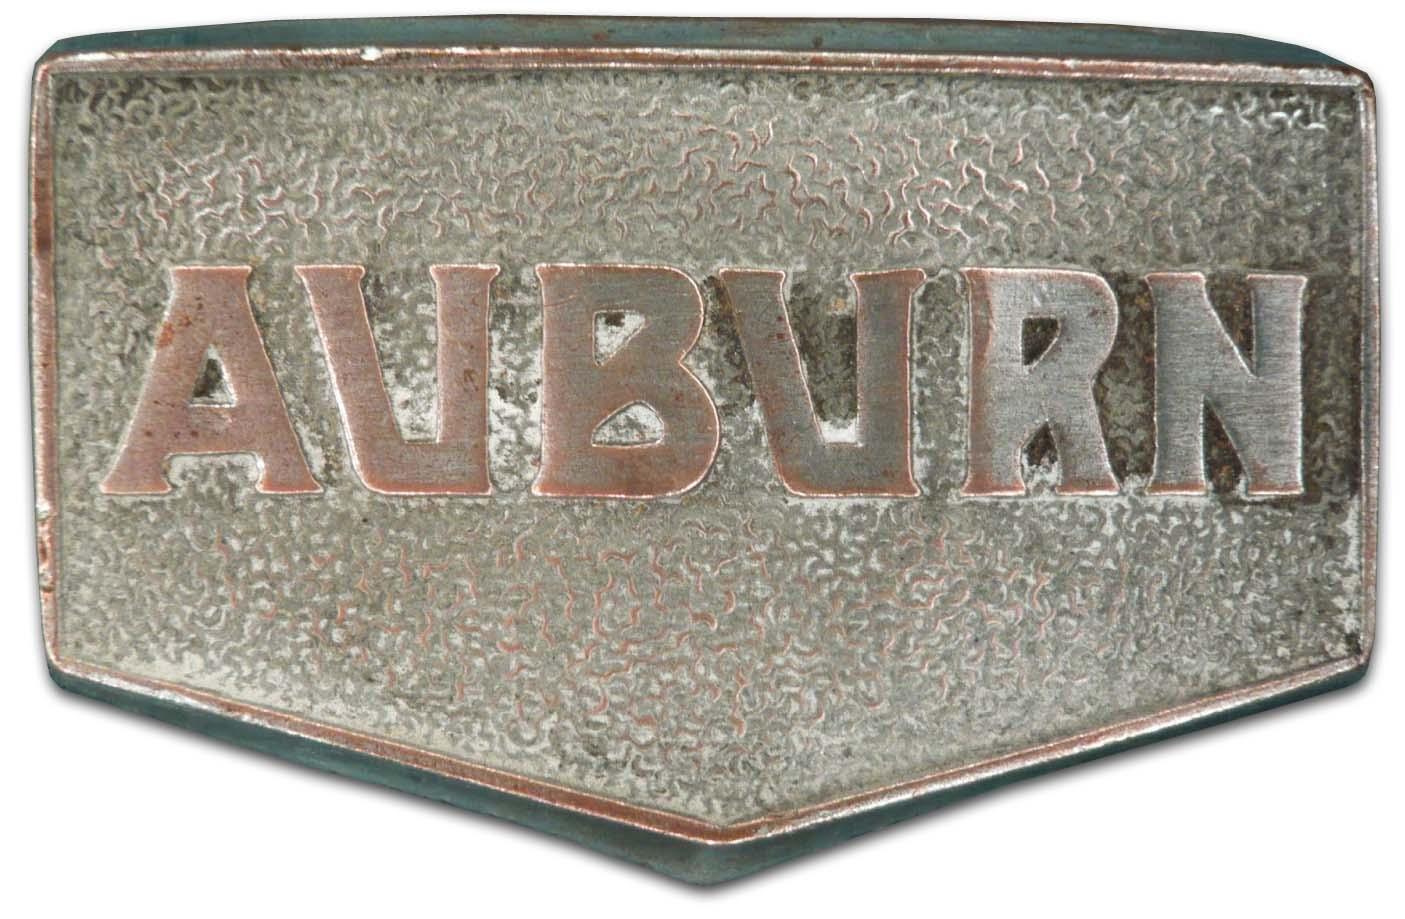 Auburn Boatail Speedster (1931 grill emblem)